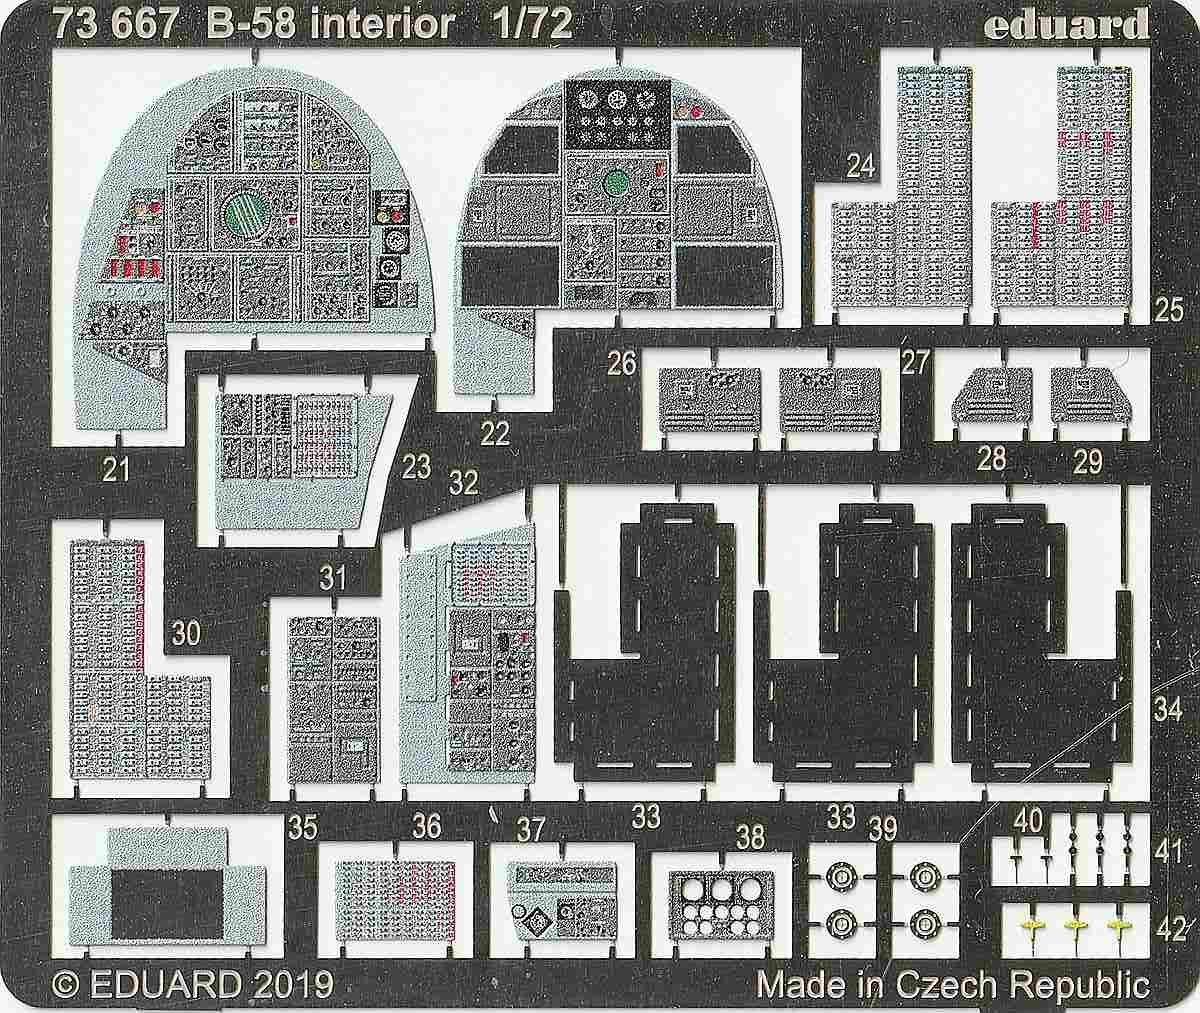 Eduard-72667-B-58-Interior-3-e1576514370861 Eduard-Detailsets für die B-58 von Italeri